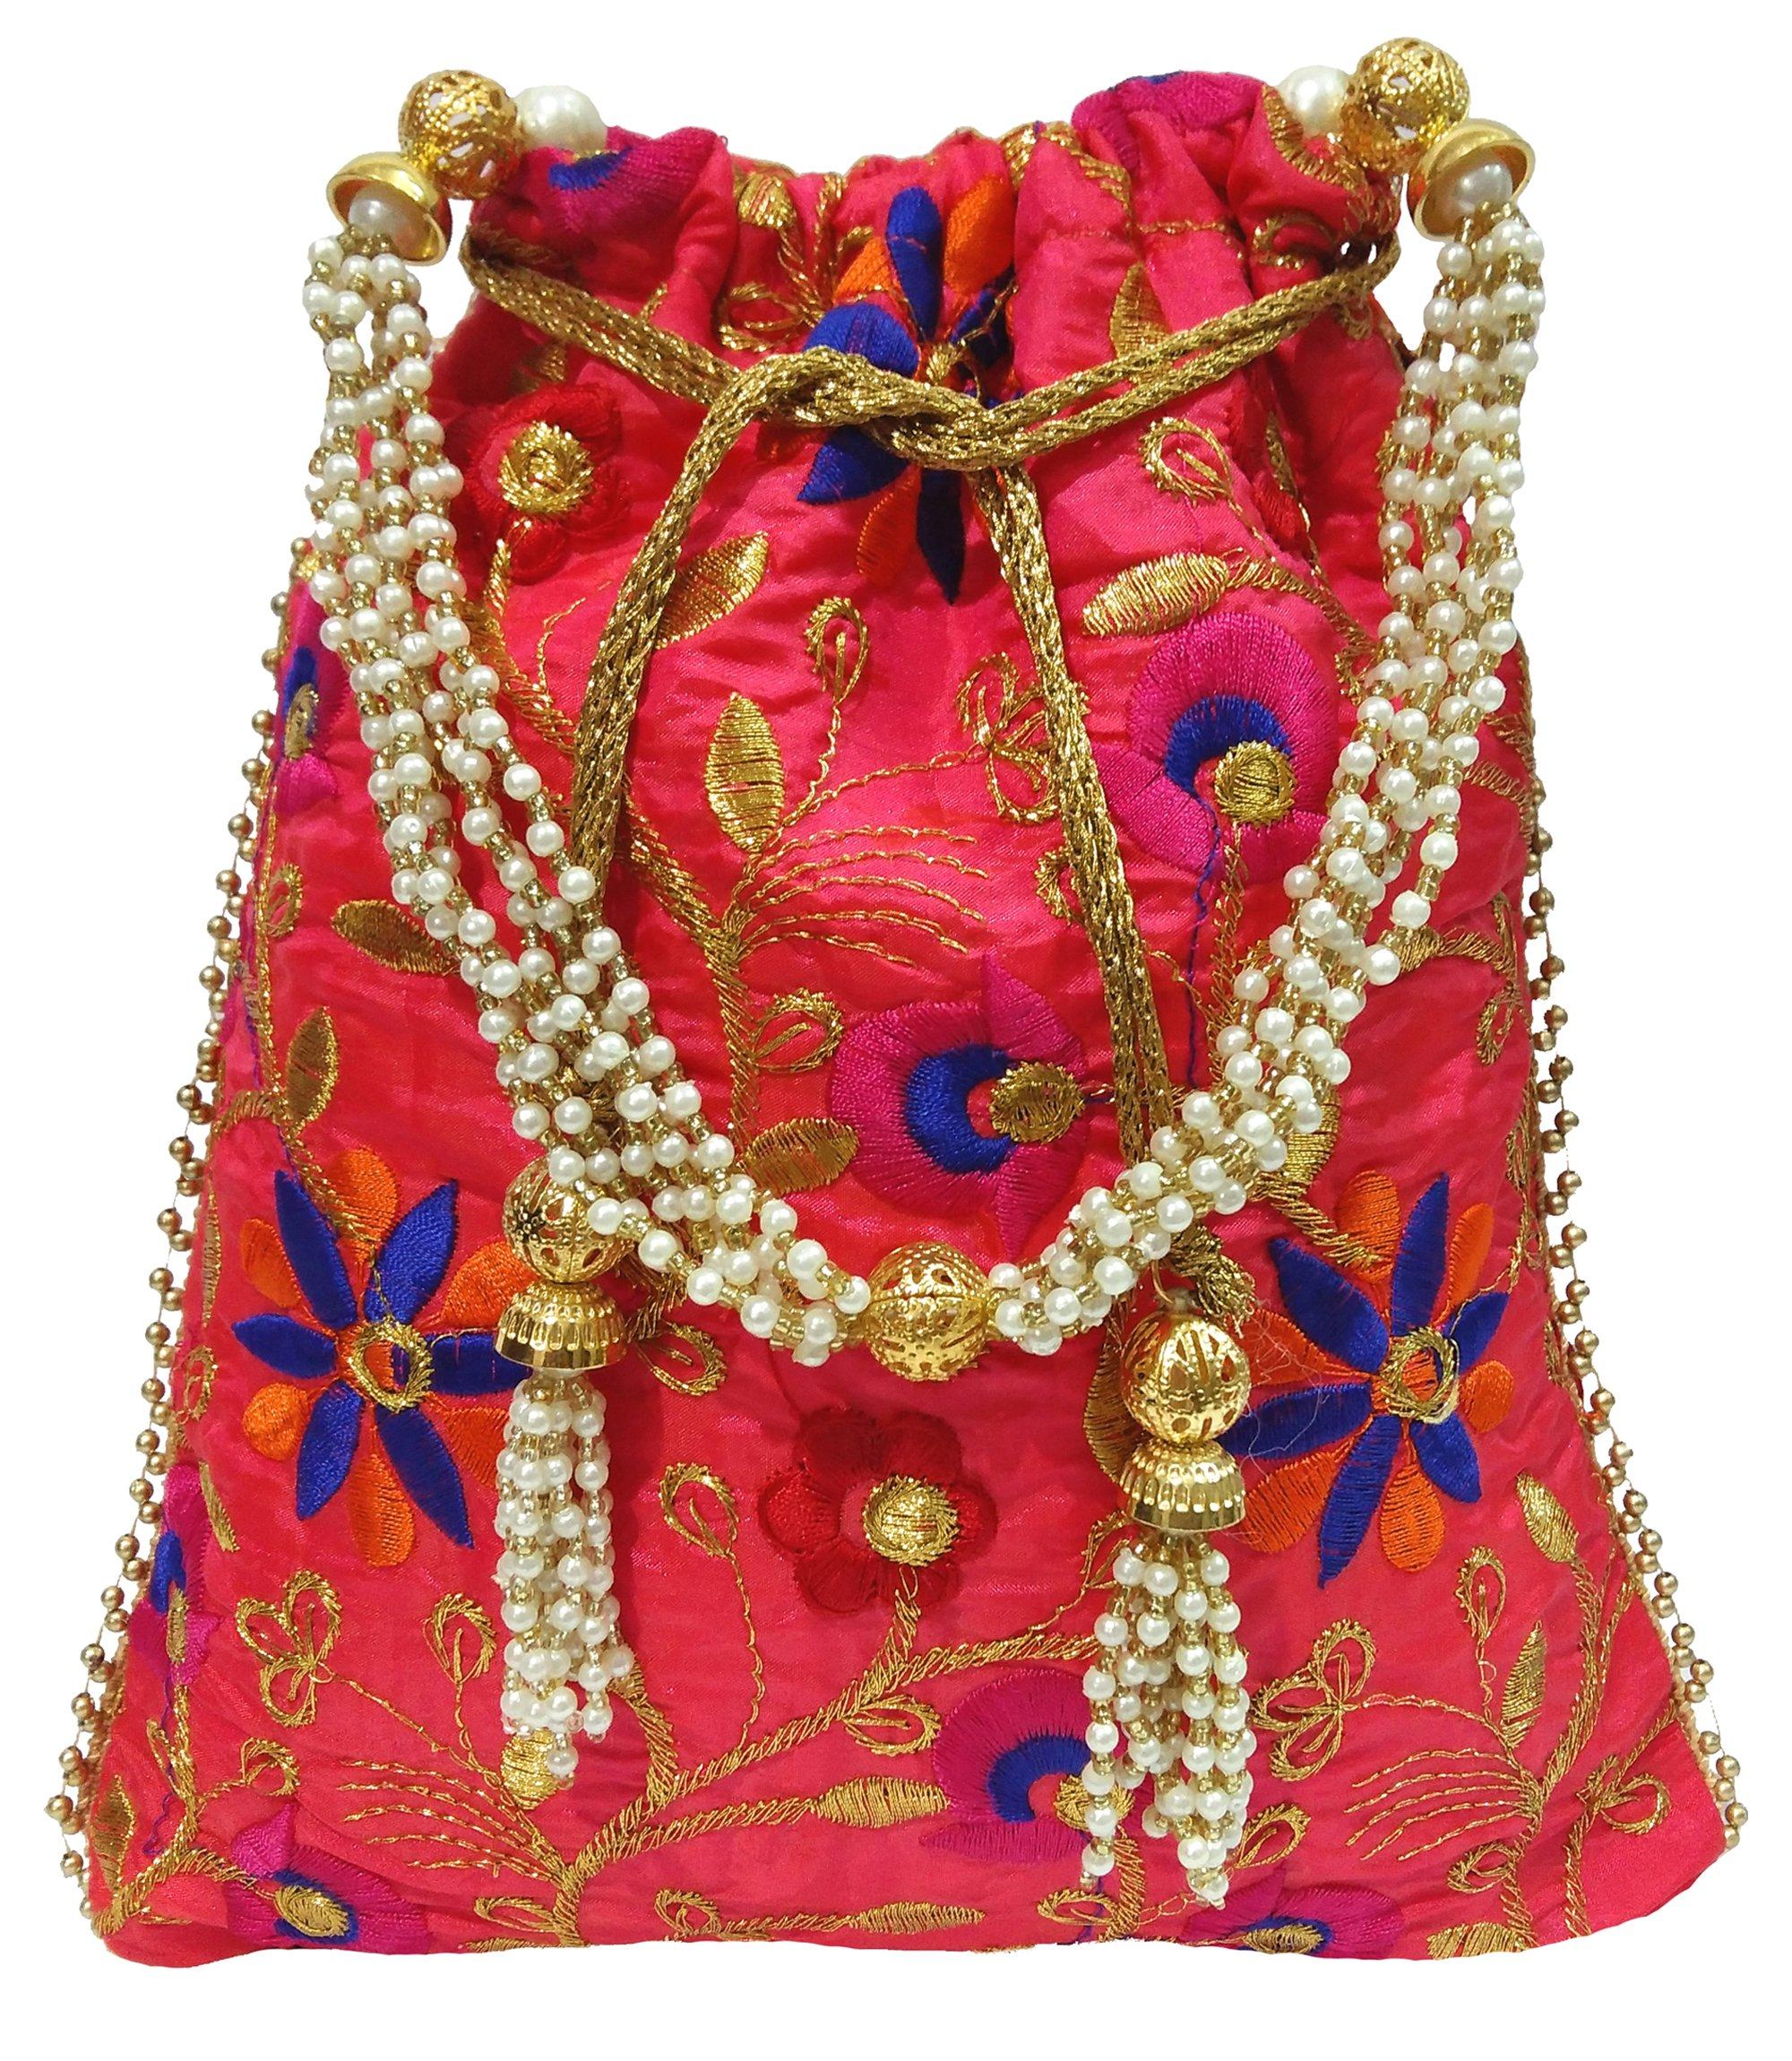 Wedding Women Purse Party Designer Bridal Clutch / Jewelry Pouch / Indian Evening Potli Handbag